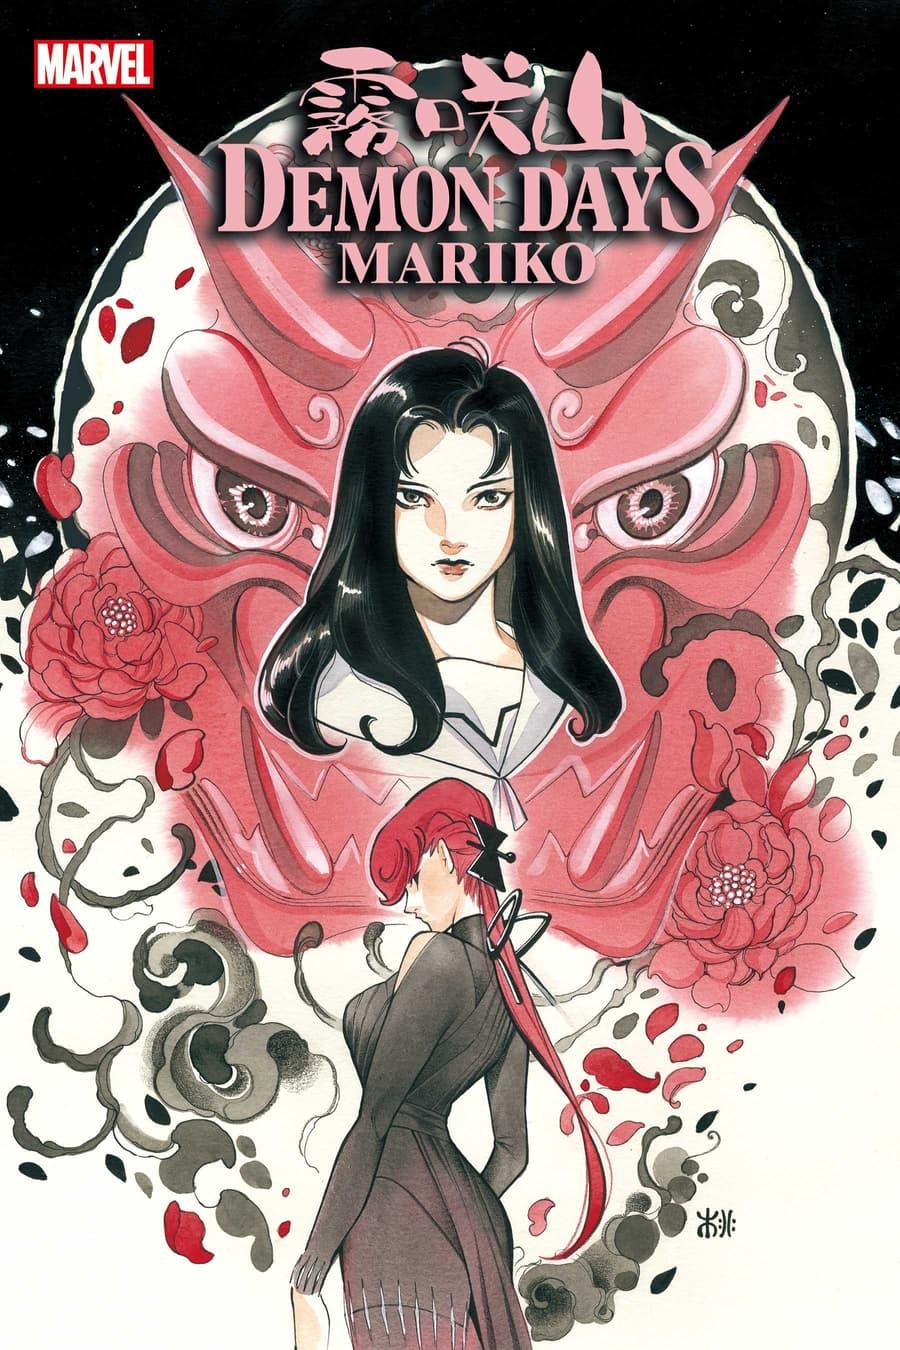 DEMON DAYS: MARIKO #1 cover by Peach Momoko